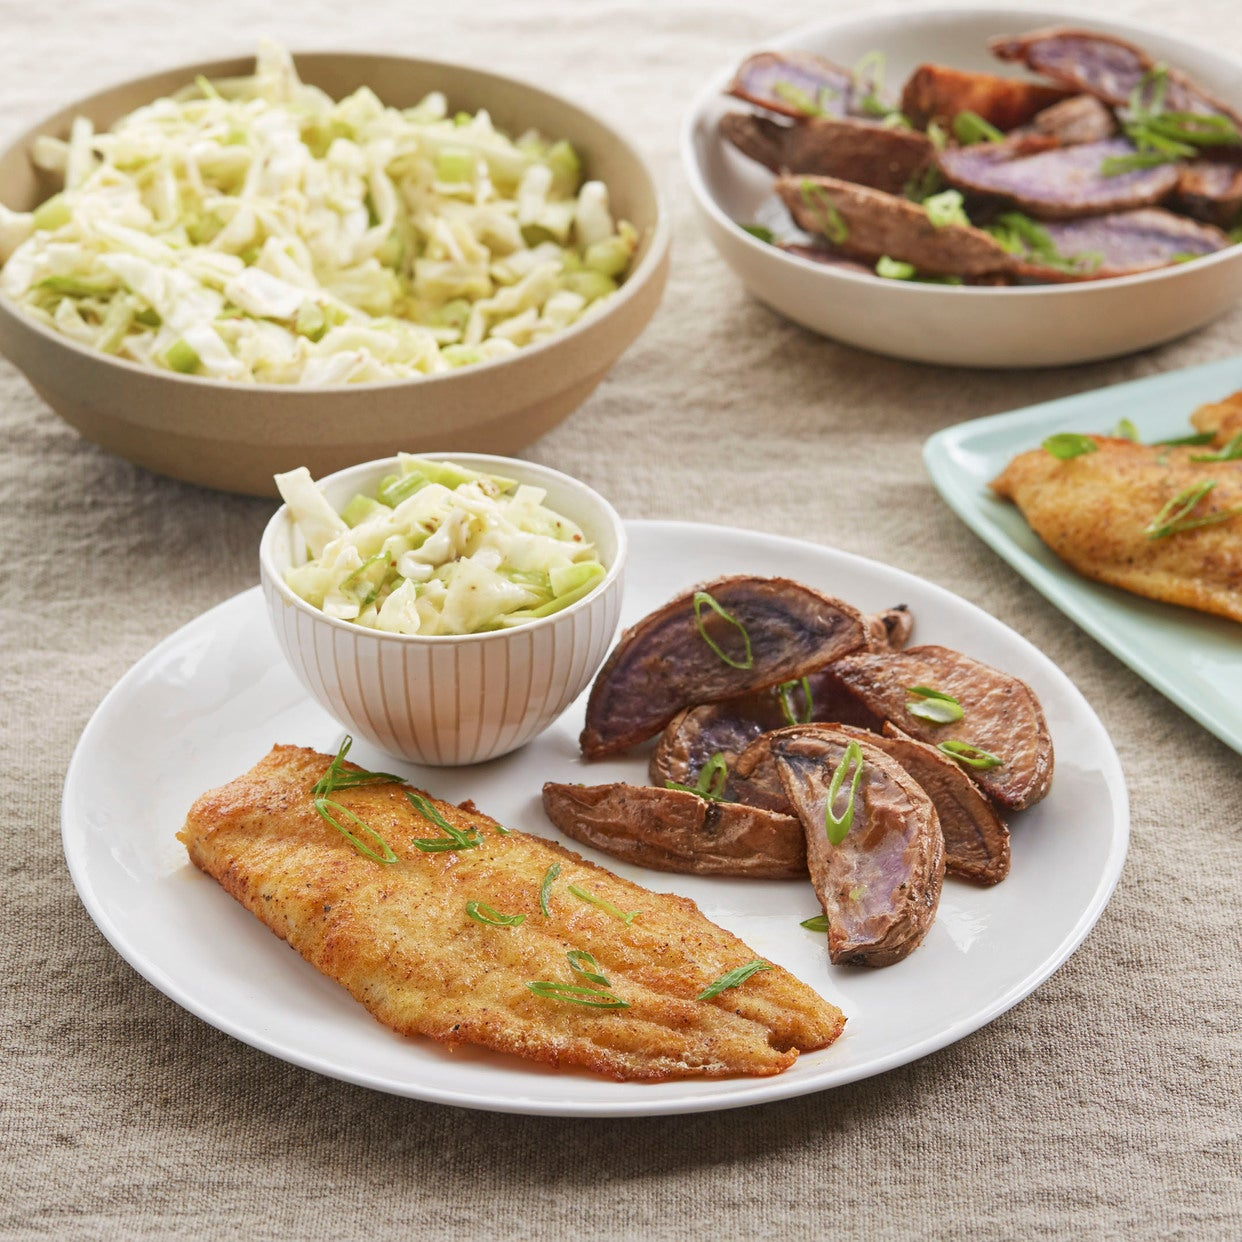 Paprika-Spiced Catfish with Cabbage Slaw & Roasted Purple Potato Wedges